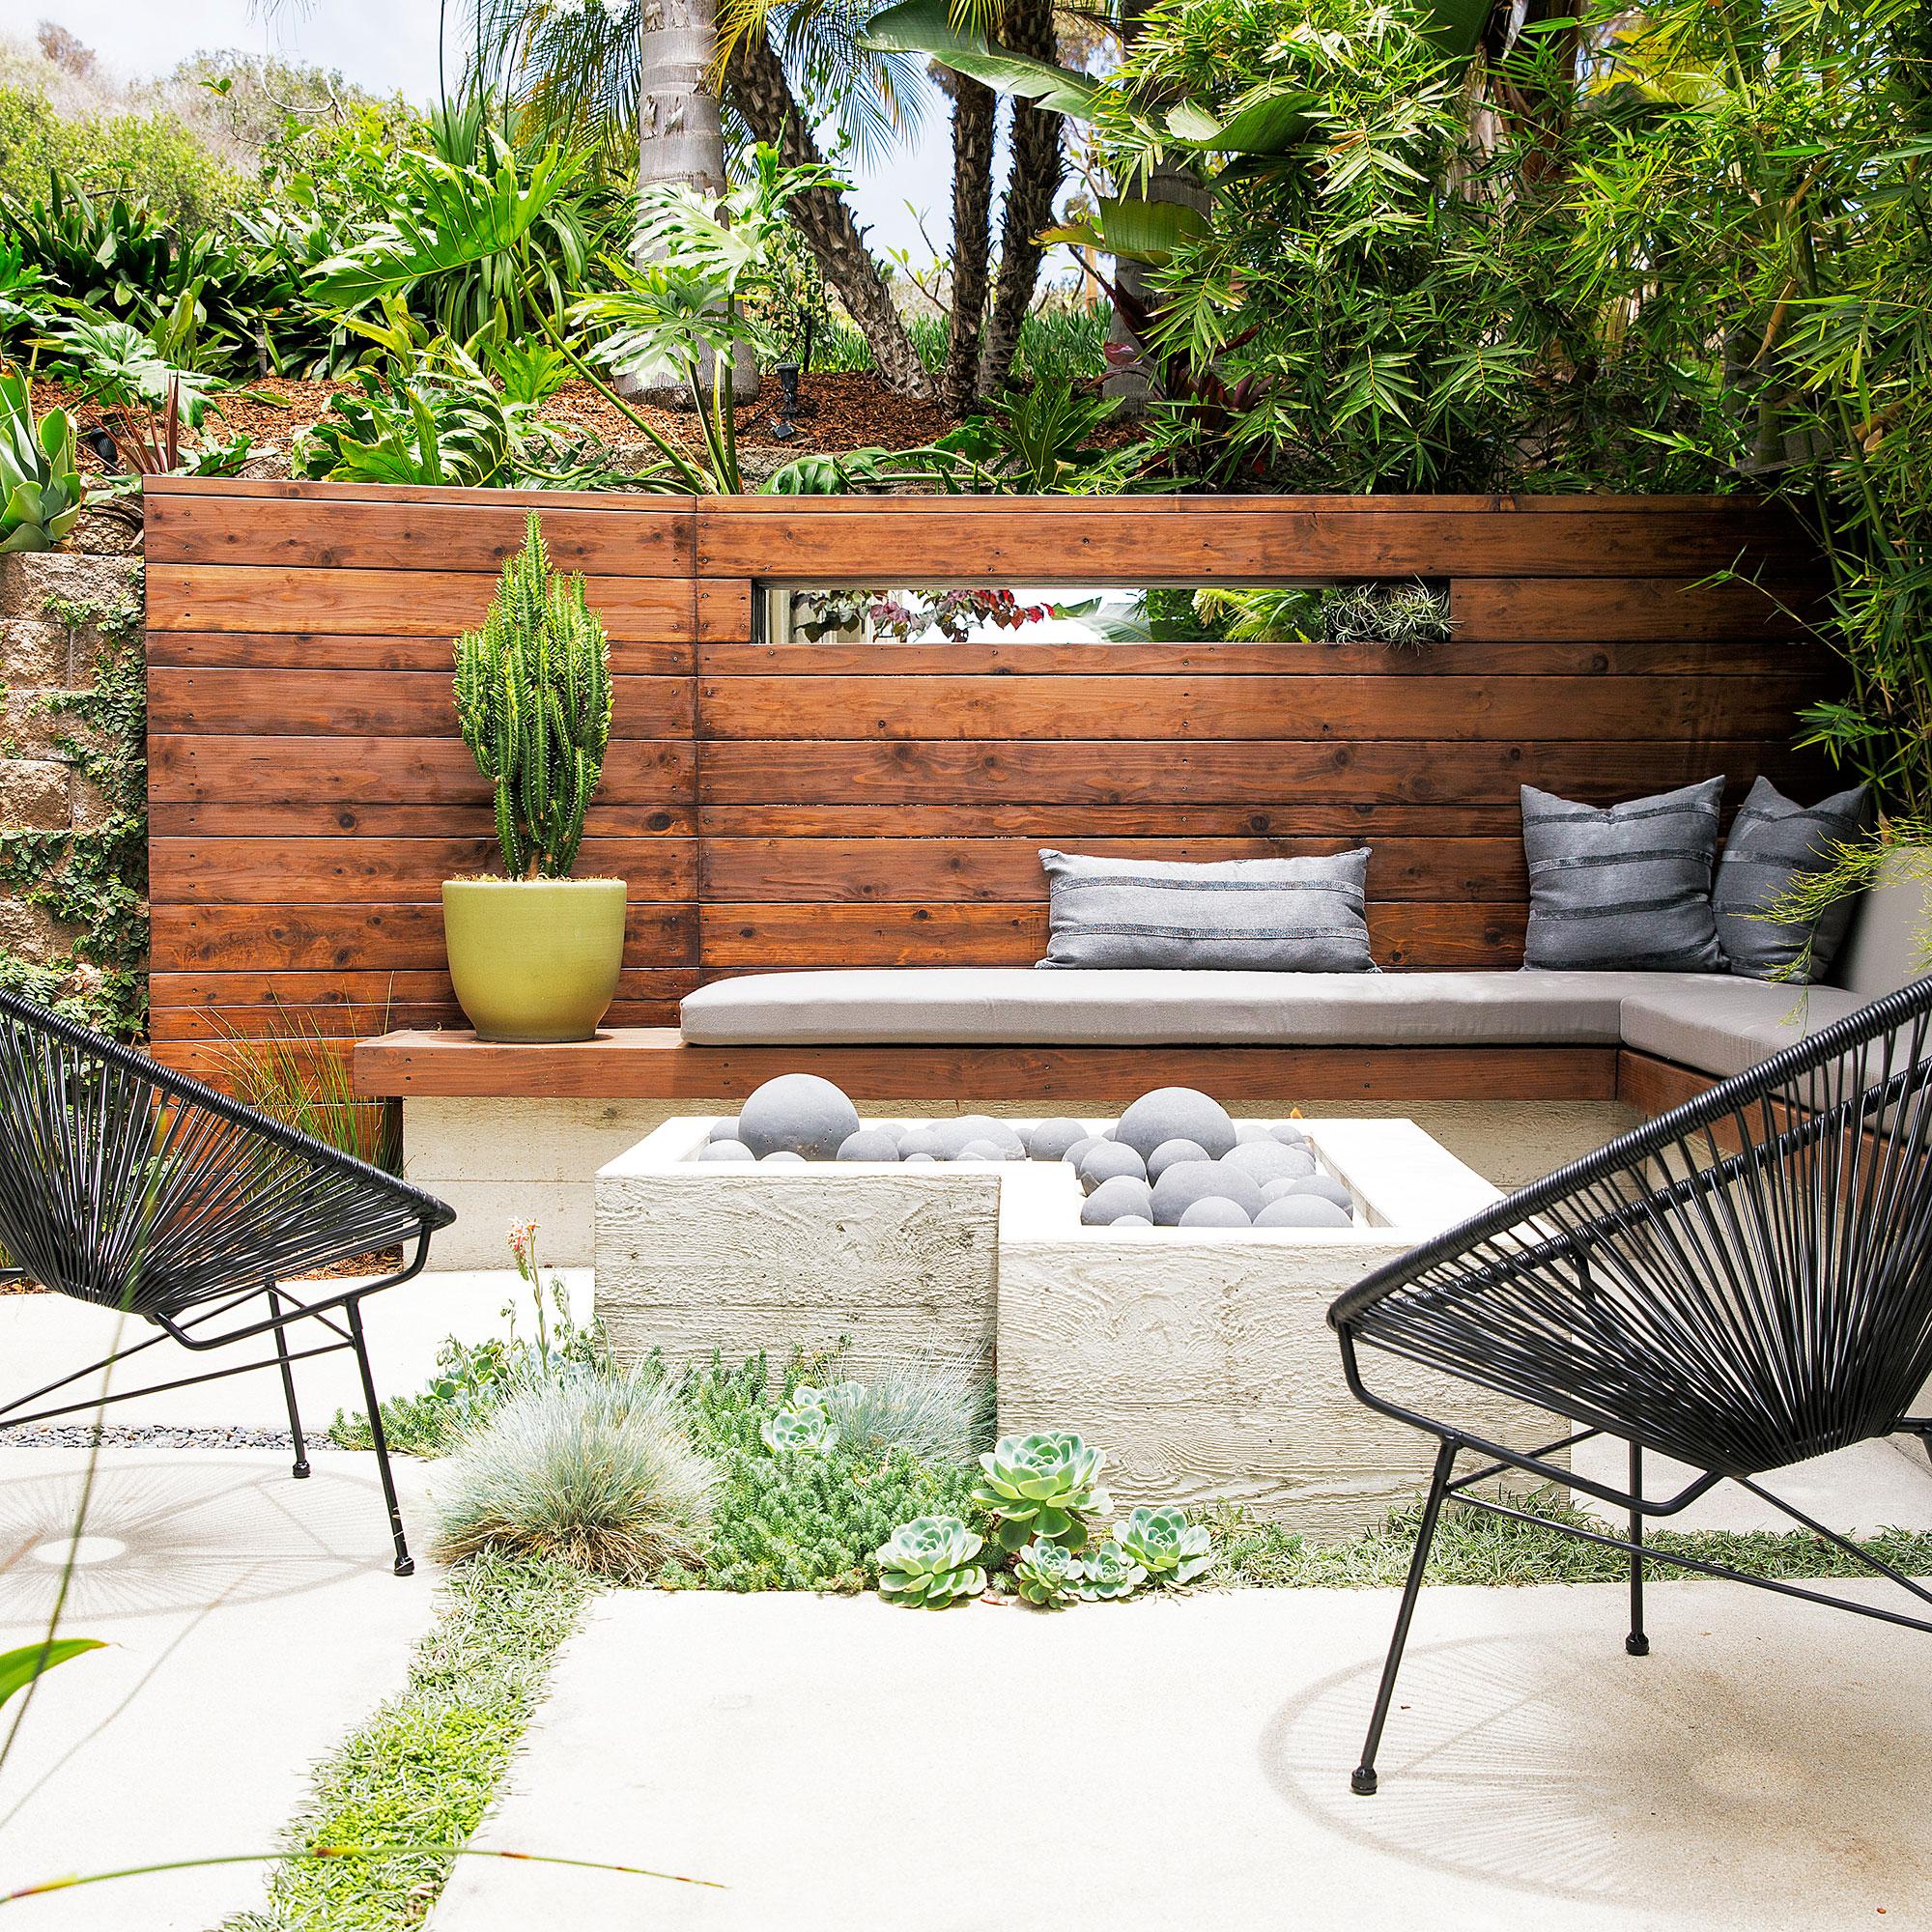 Retaining Wall Ideas - Sunset Magazine on Patio Stone Wall Ideas  id=75058